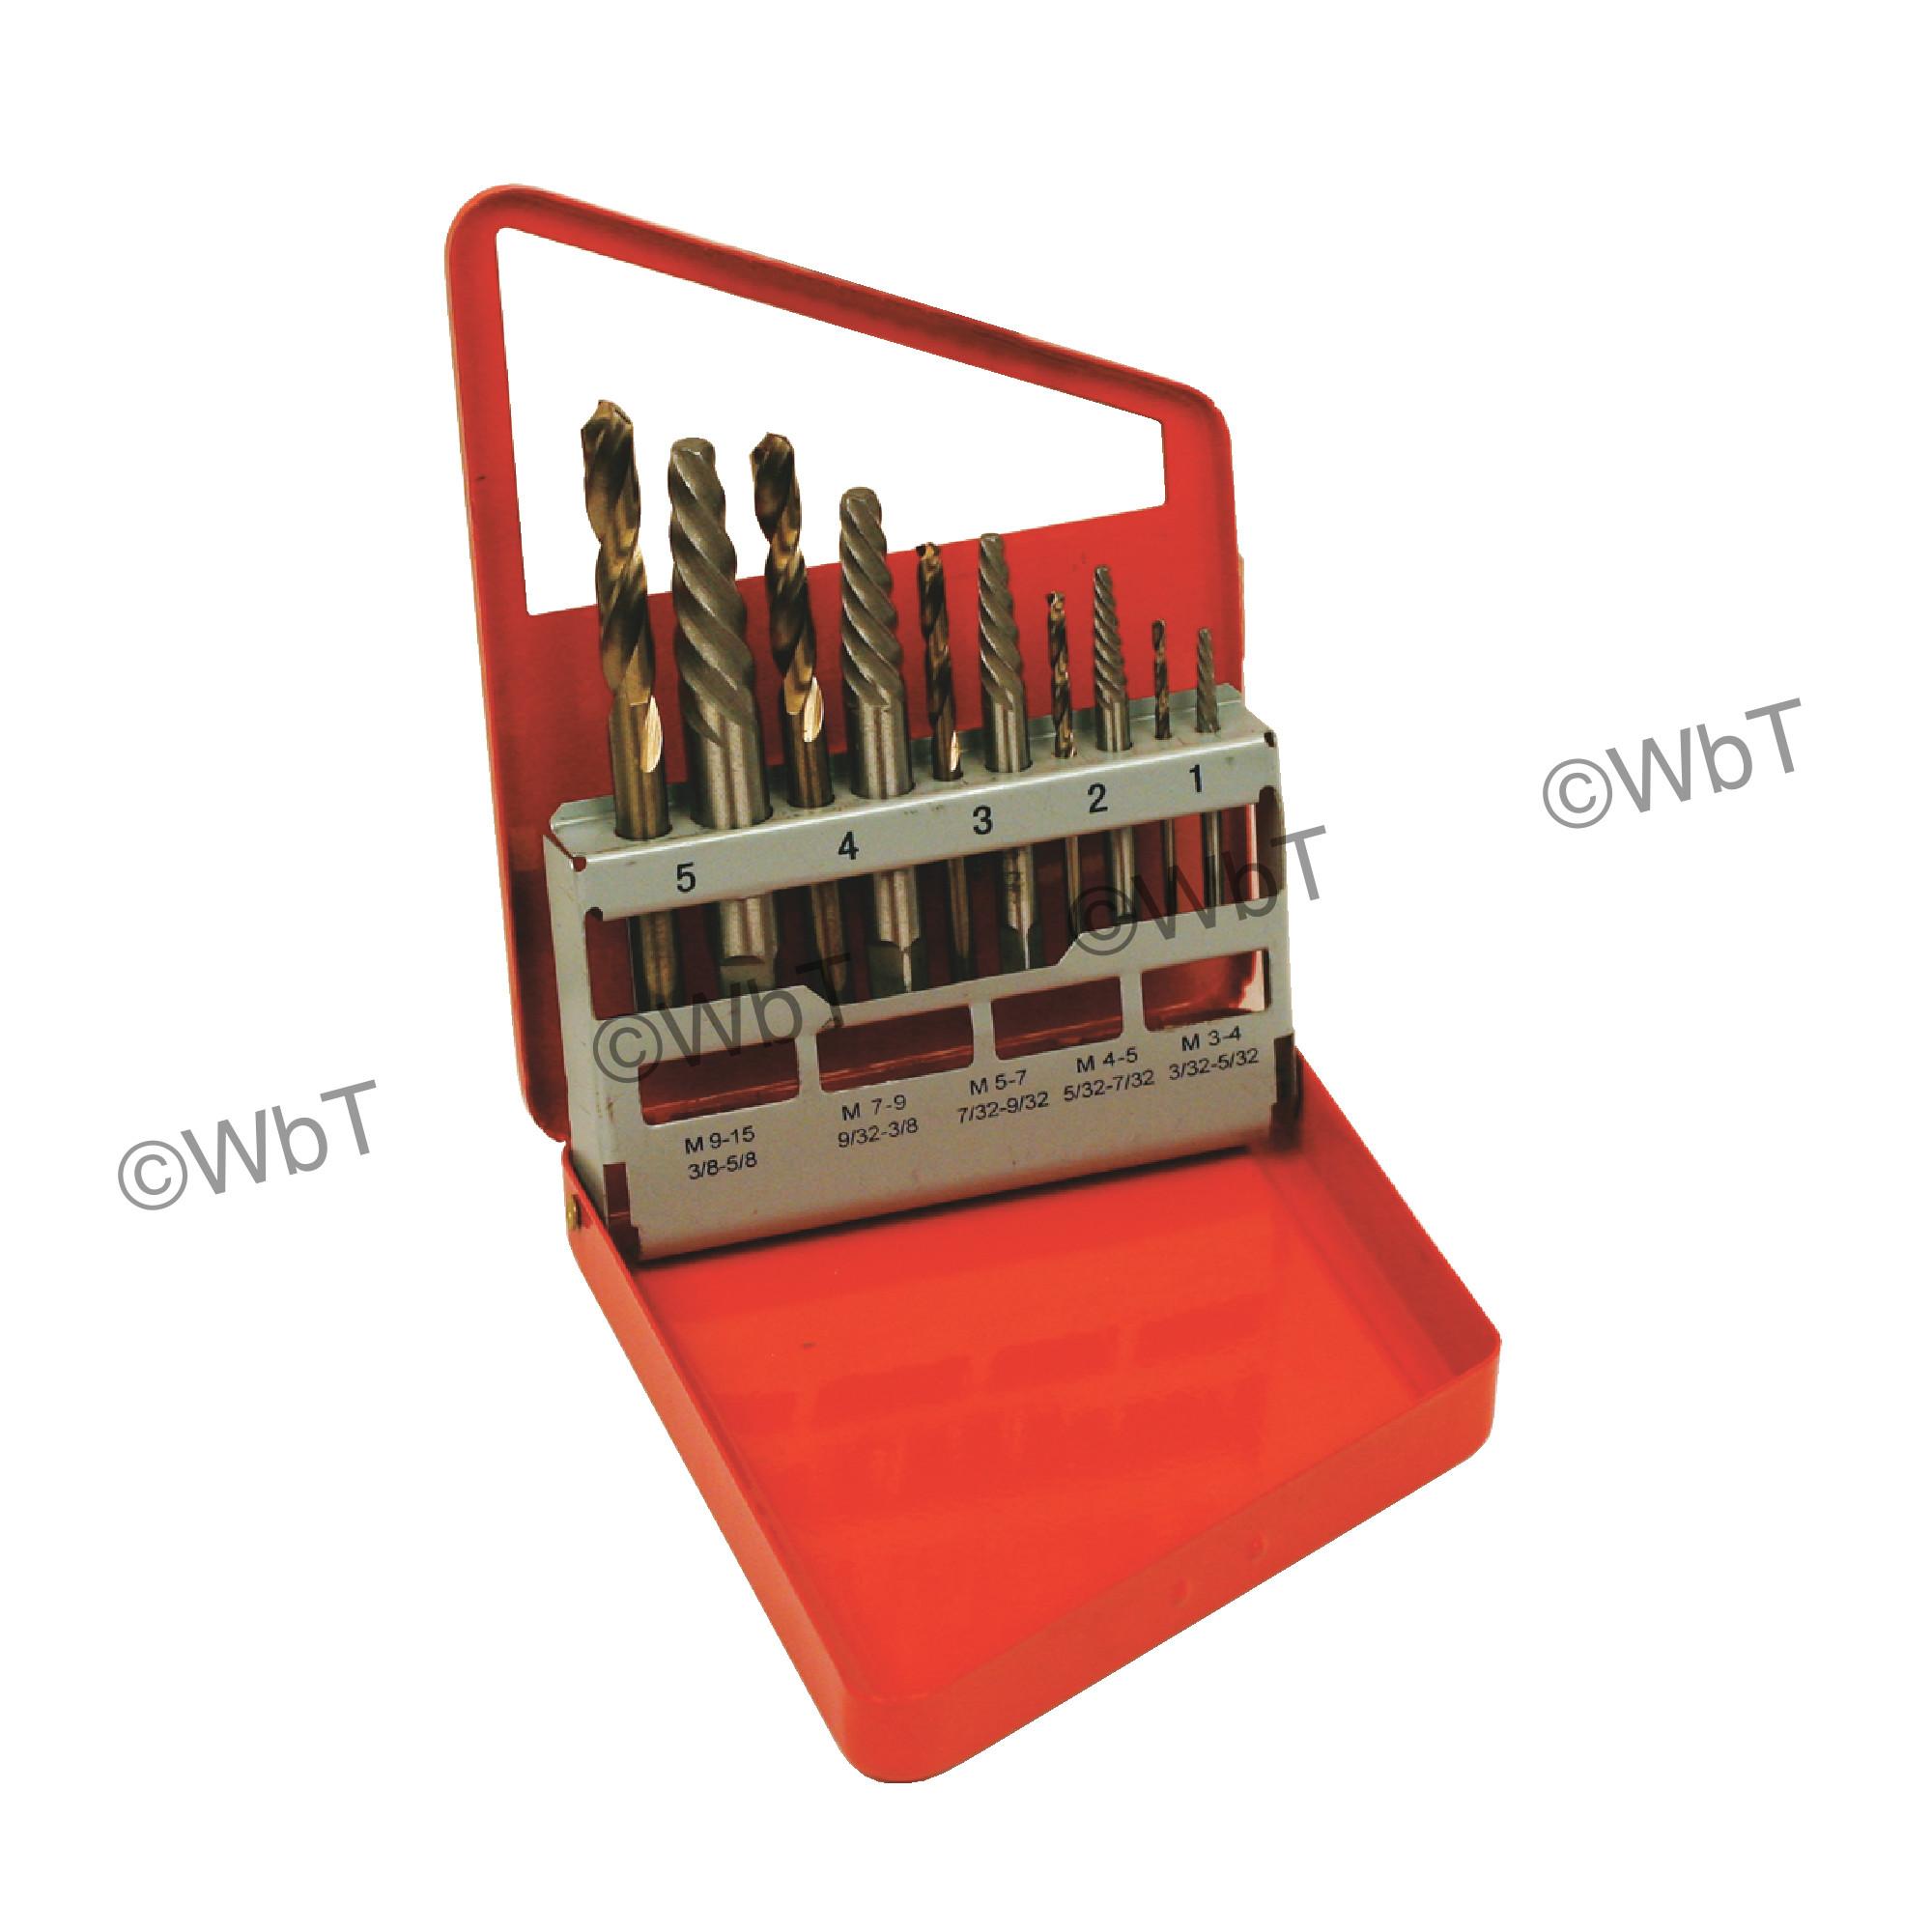 11 Piece High Speed Steel Cobalt Drill & Extractor Set